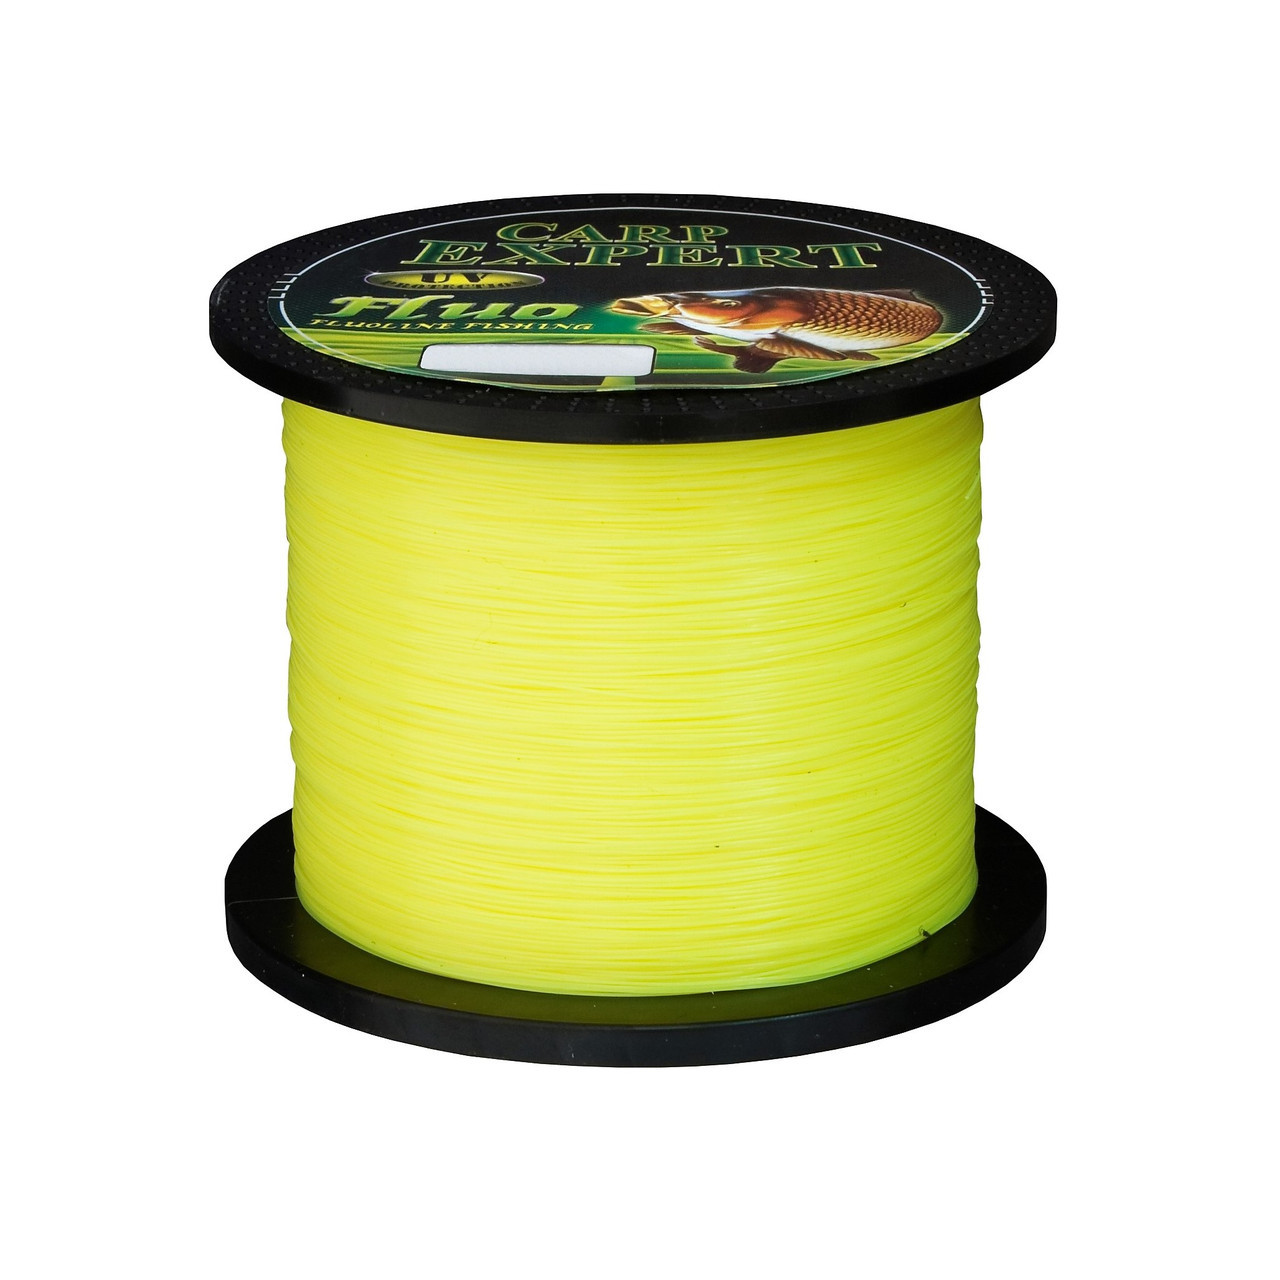 Леска Energofish Carp Expert UV Fluo Yellow 1000m 0.40mm 18.7kg (30120840)